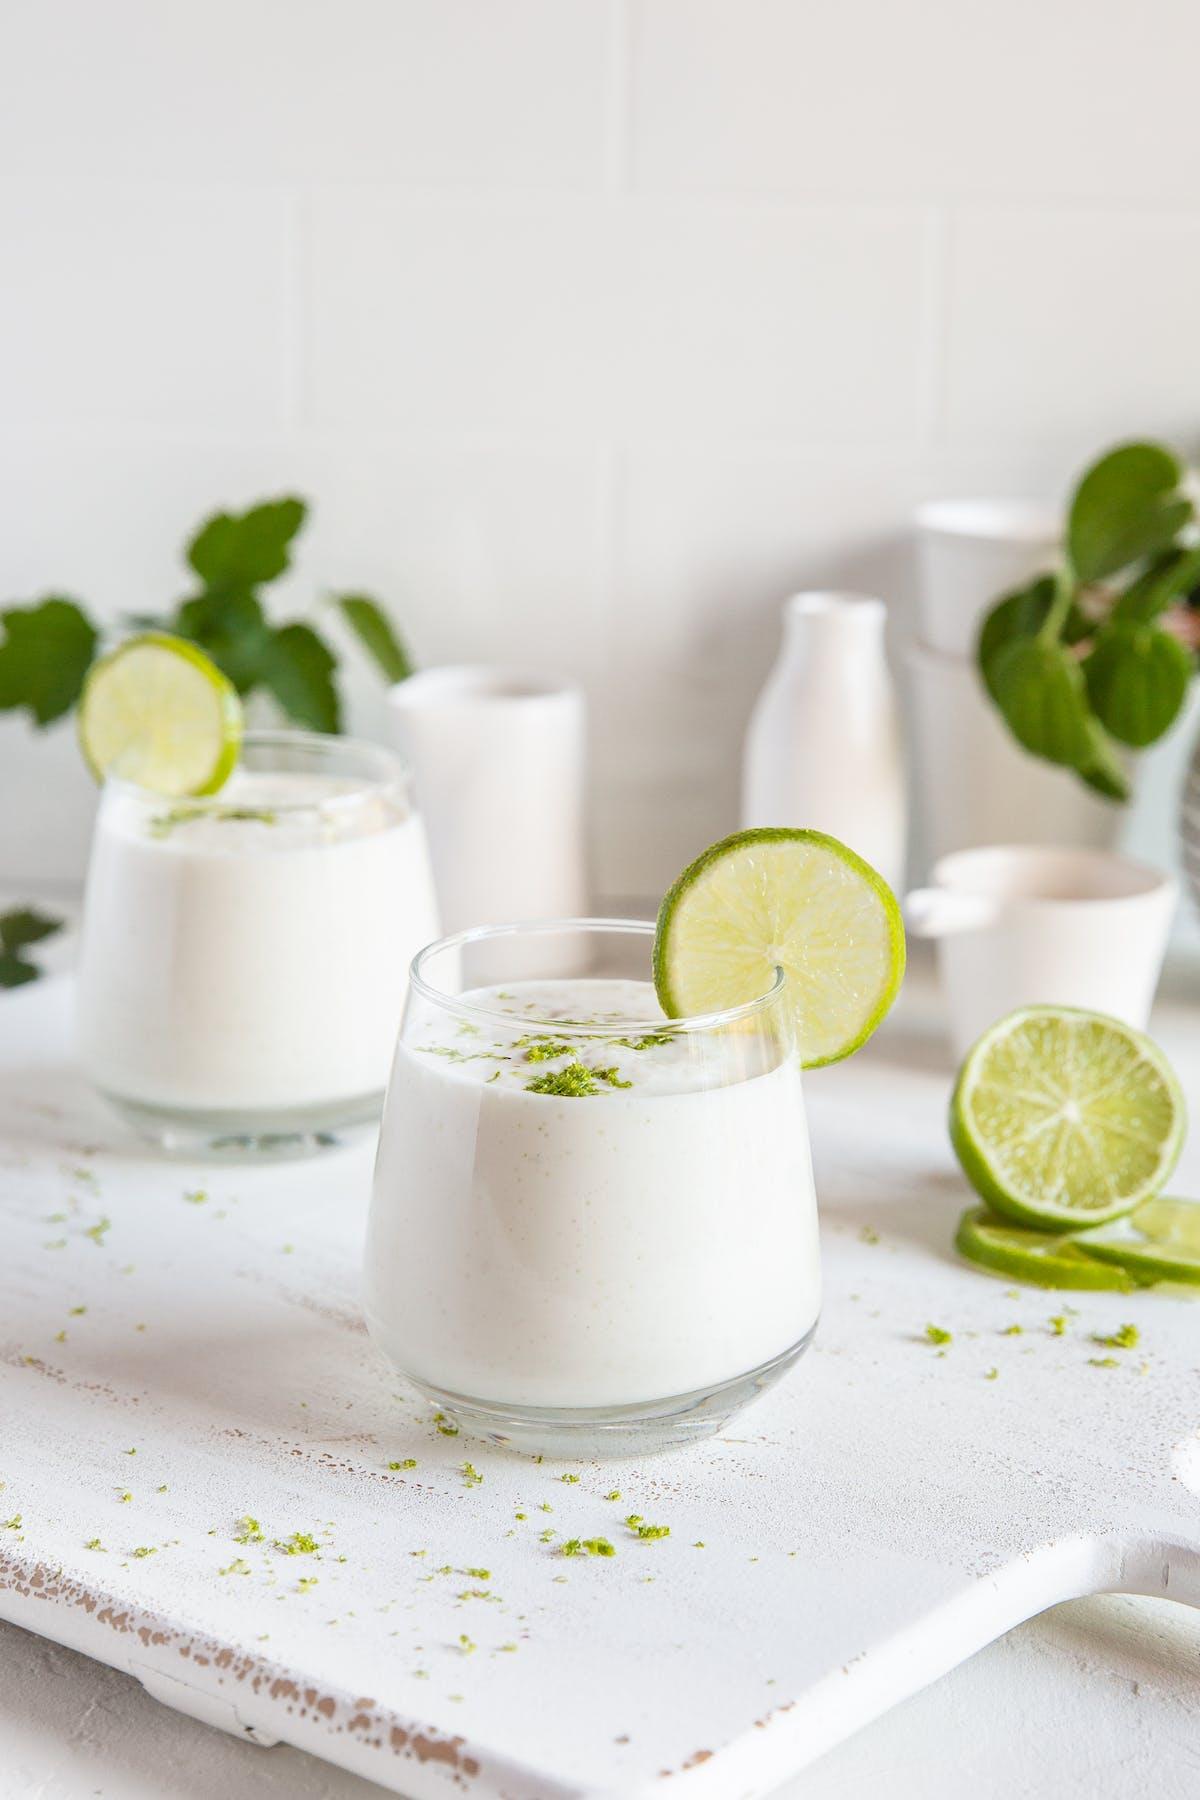 Exquisito smoothie de lima alto en proteínas